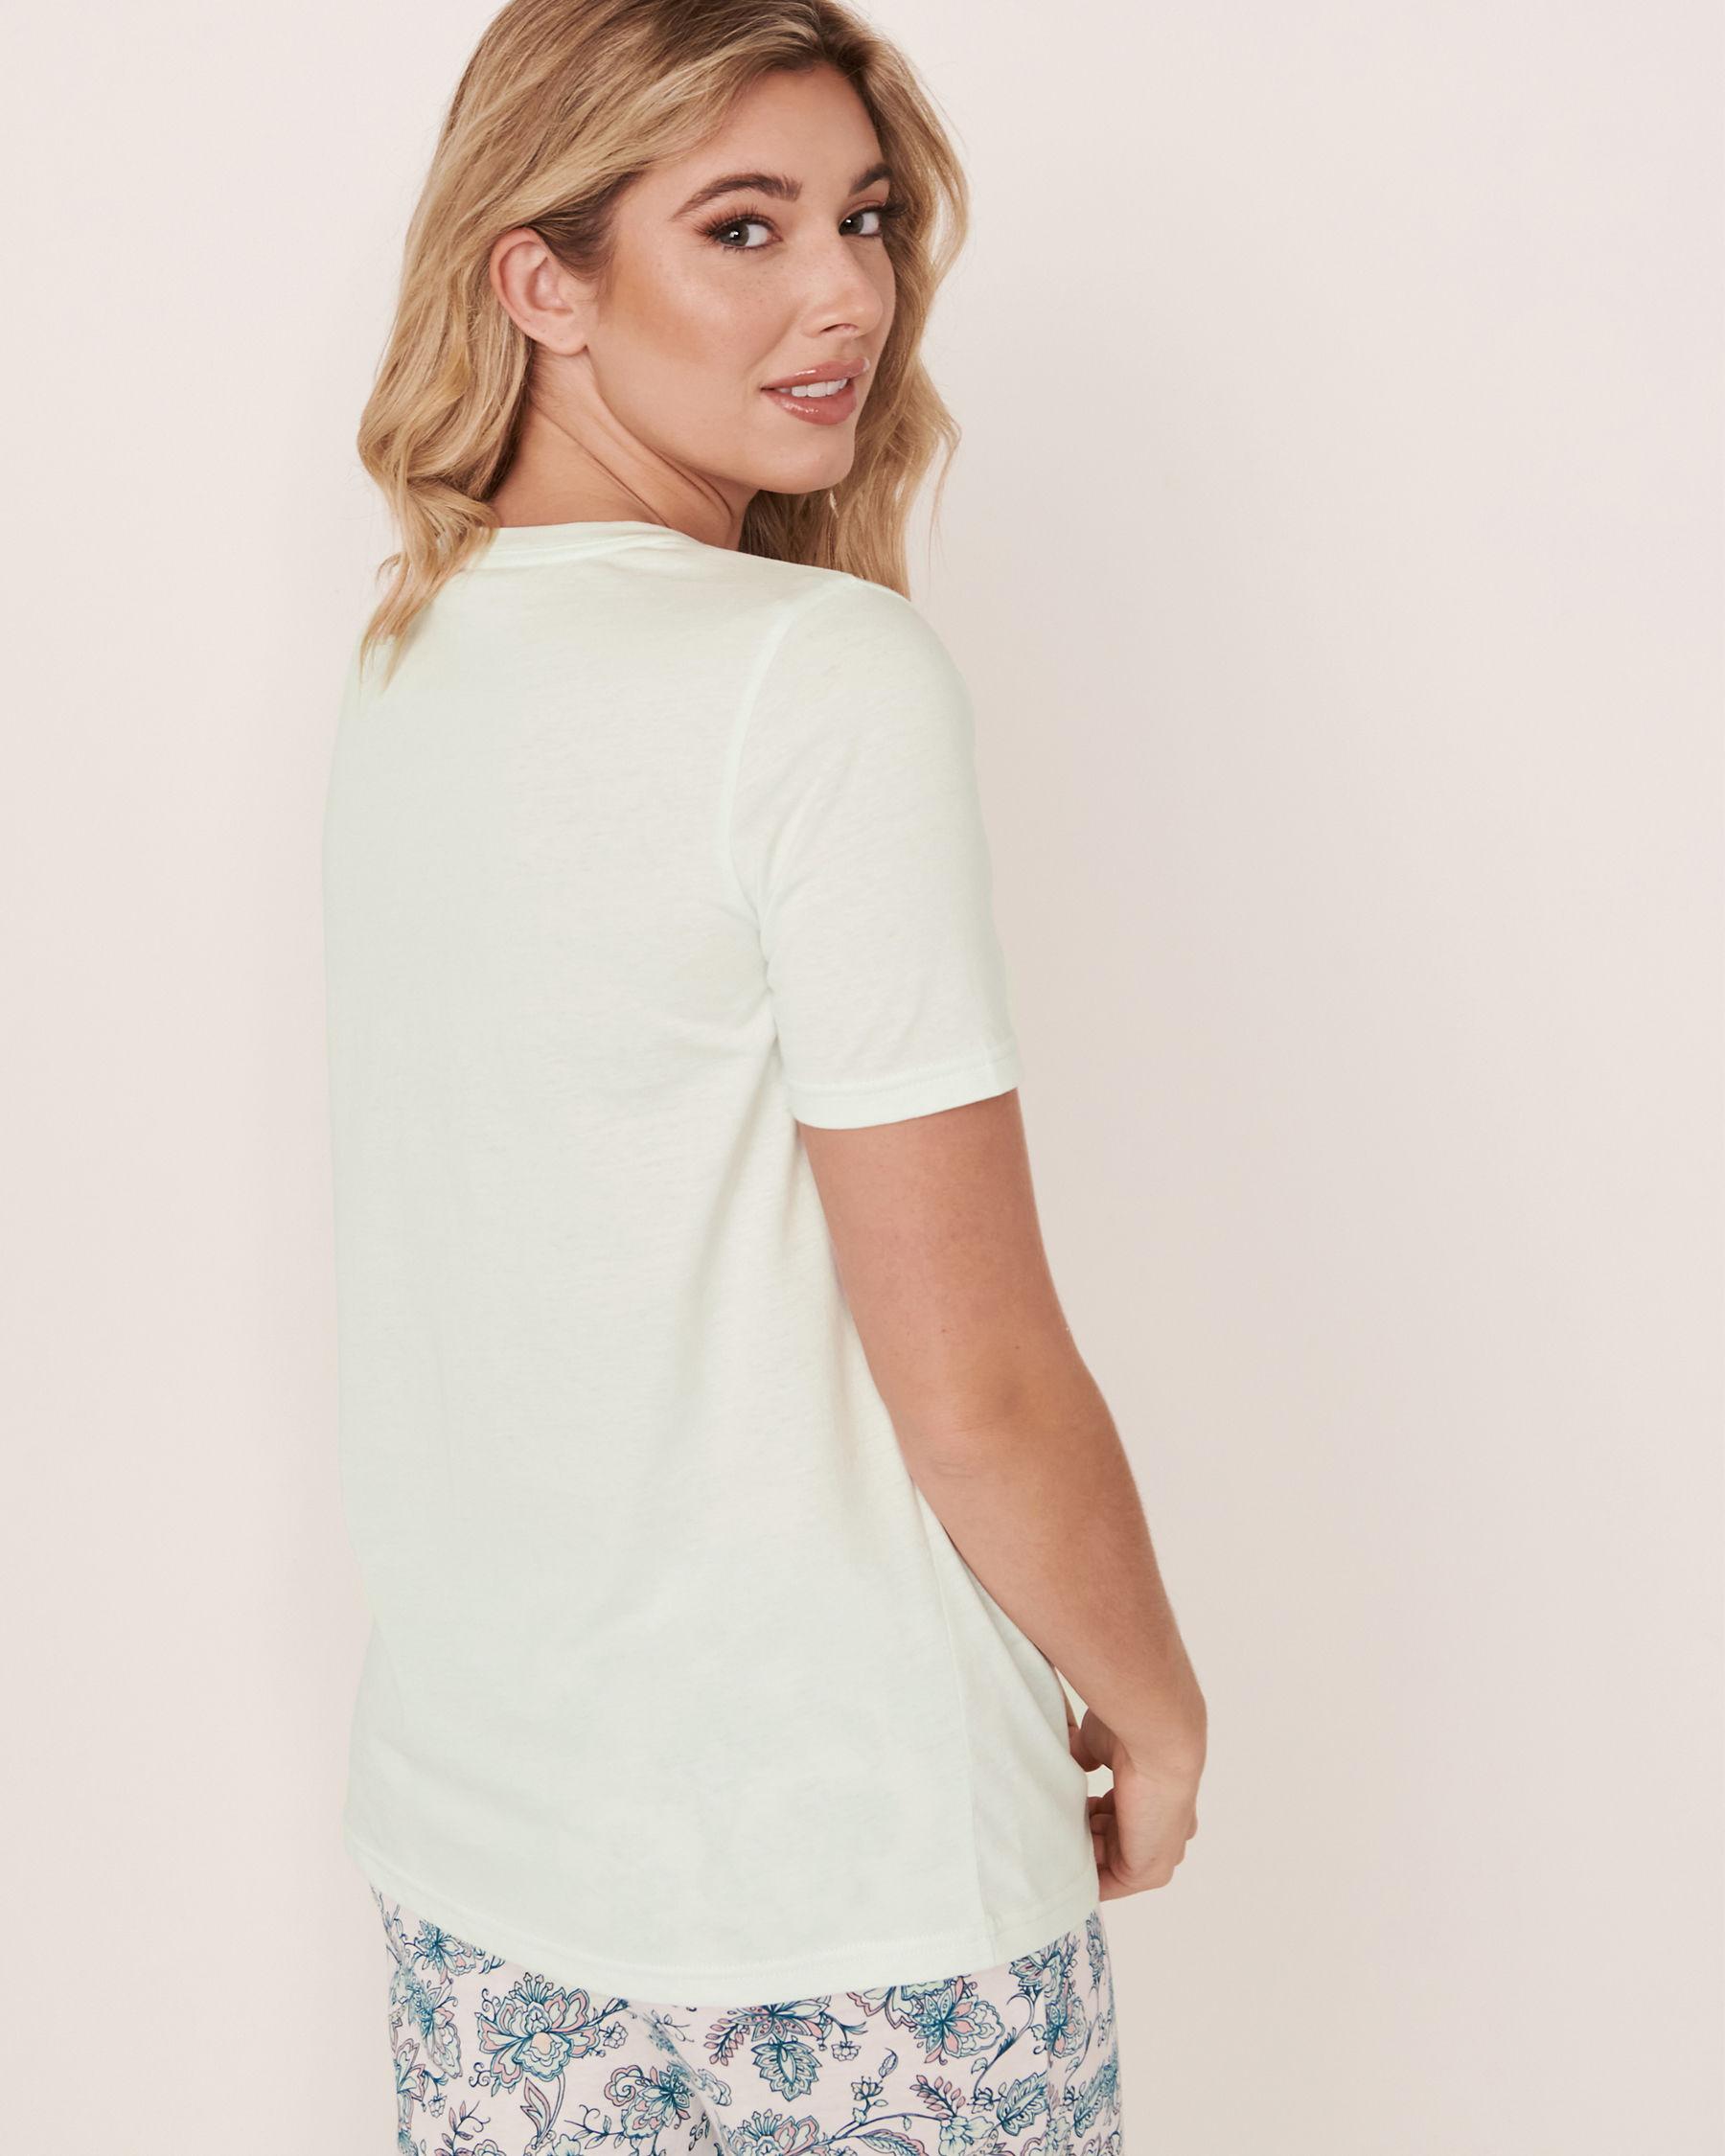 LA VIE EN ROSE V-neckline T-shirt Light aqua 40100180 - View2